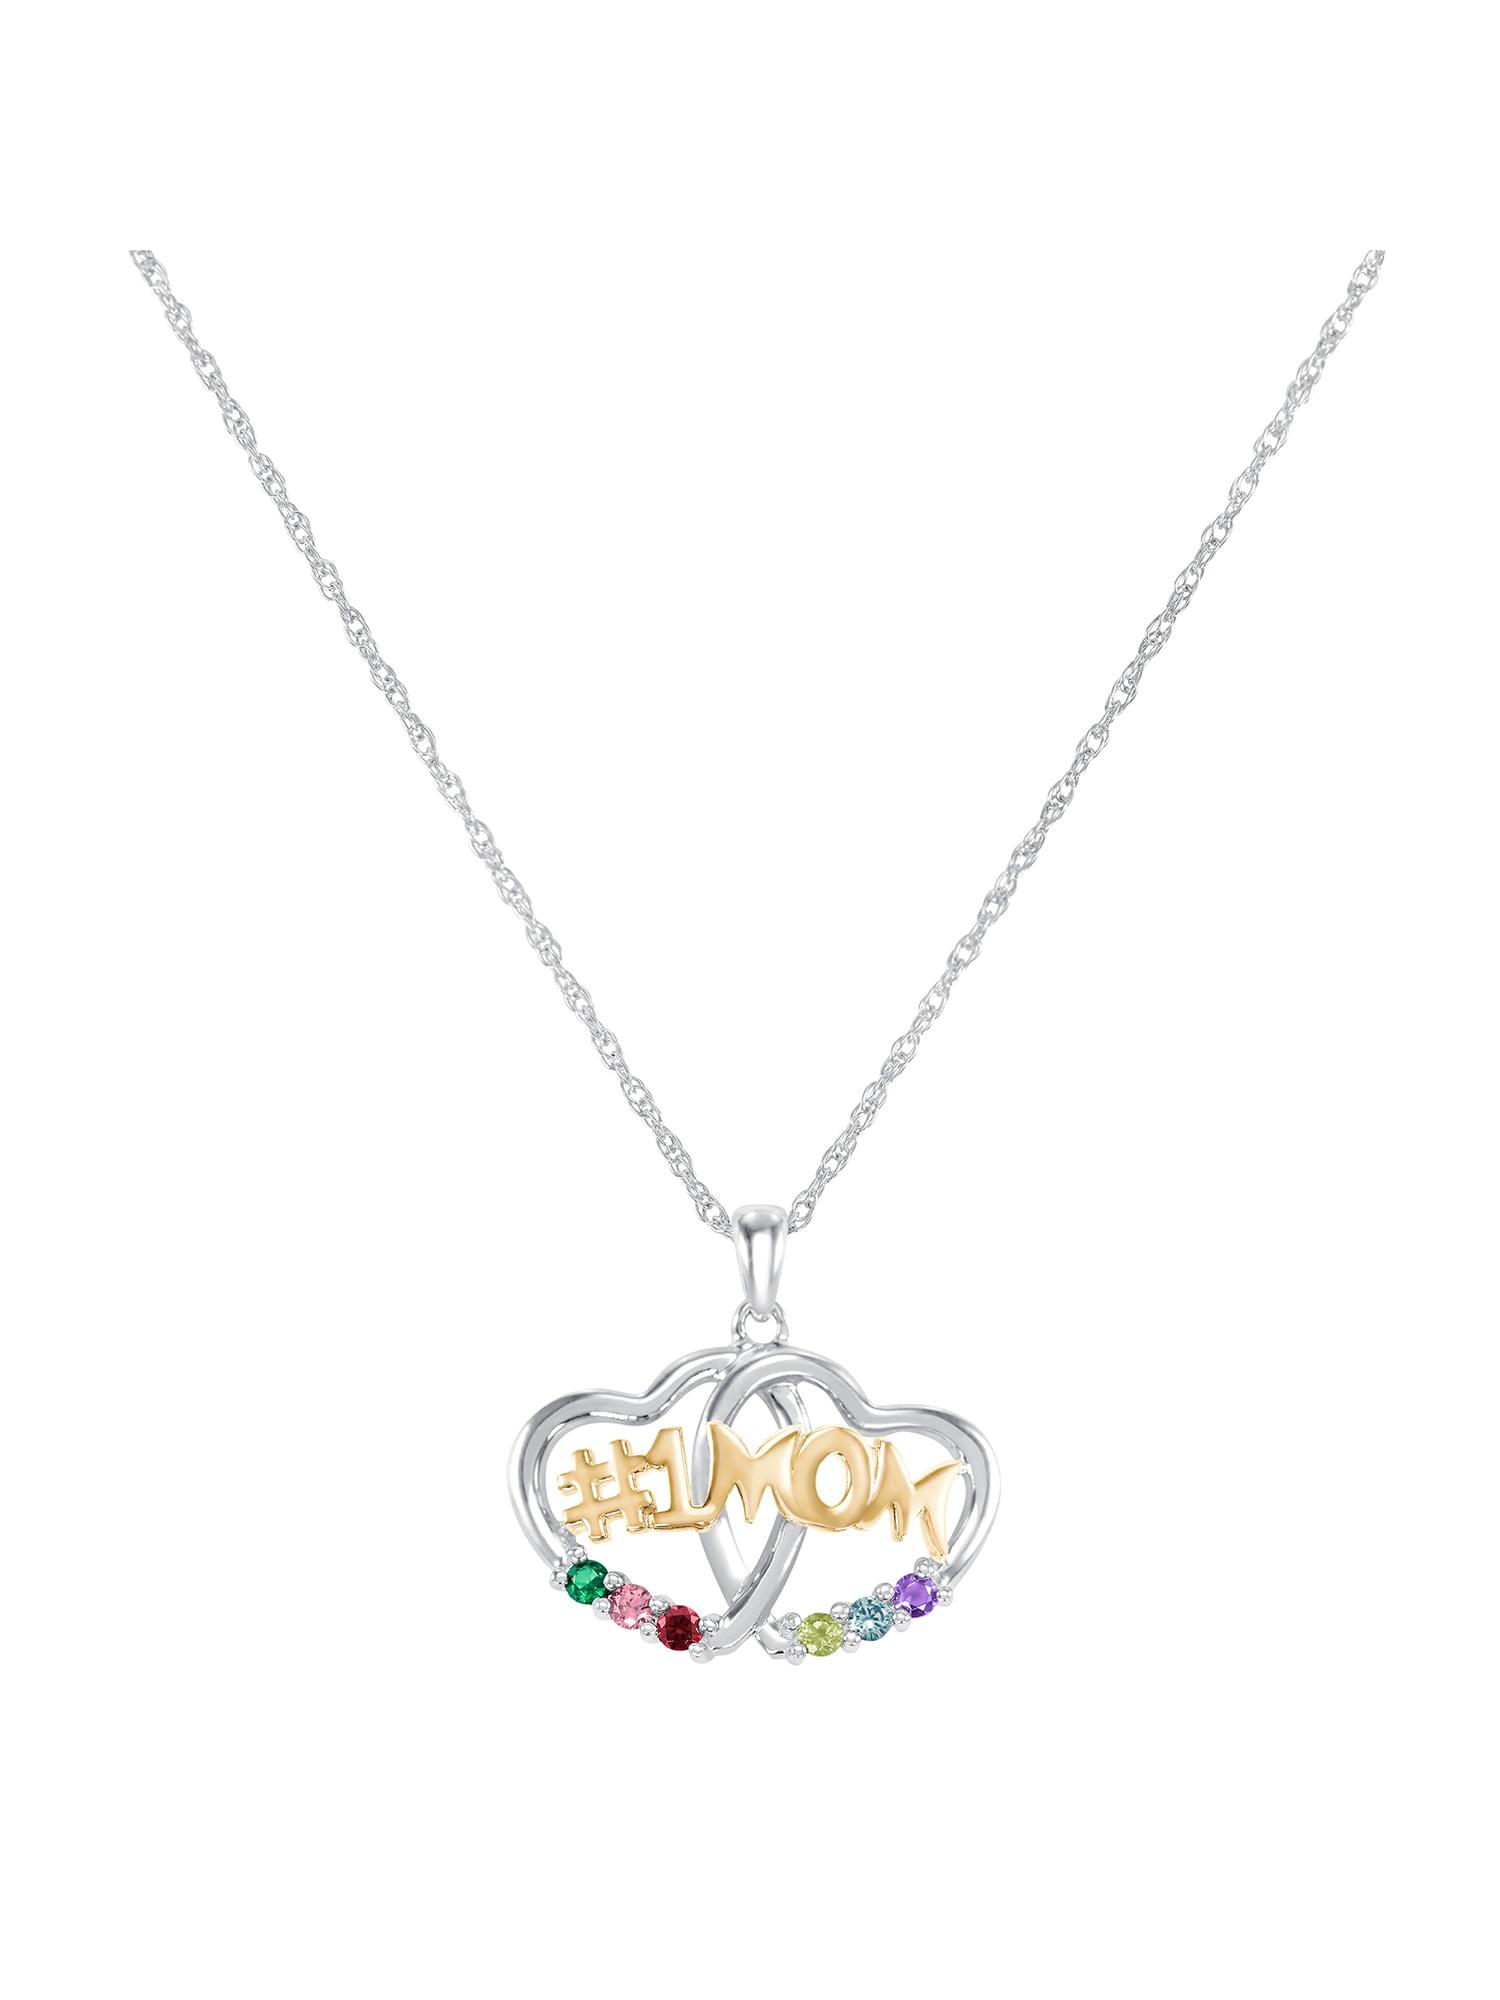 Keepsake Personalized Family Jewelry Jessamine 6 Genuine or Simulated Birthstone Pendant